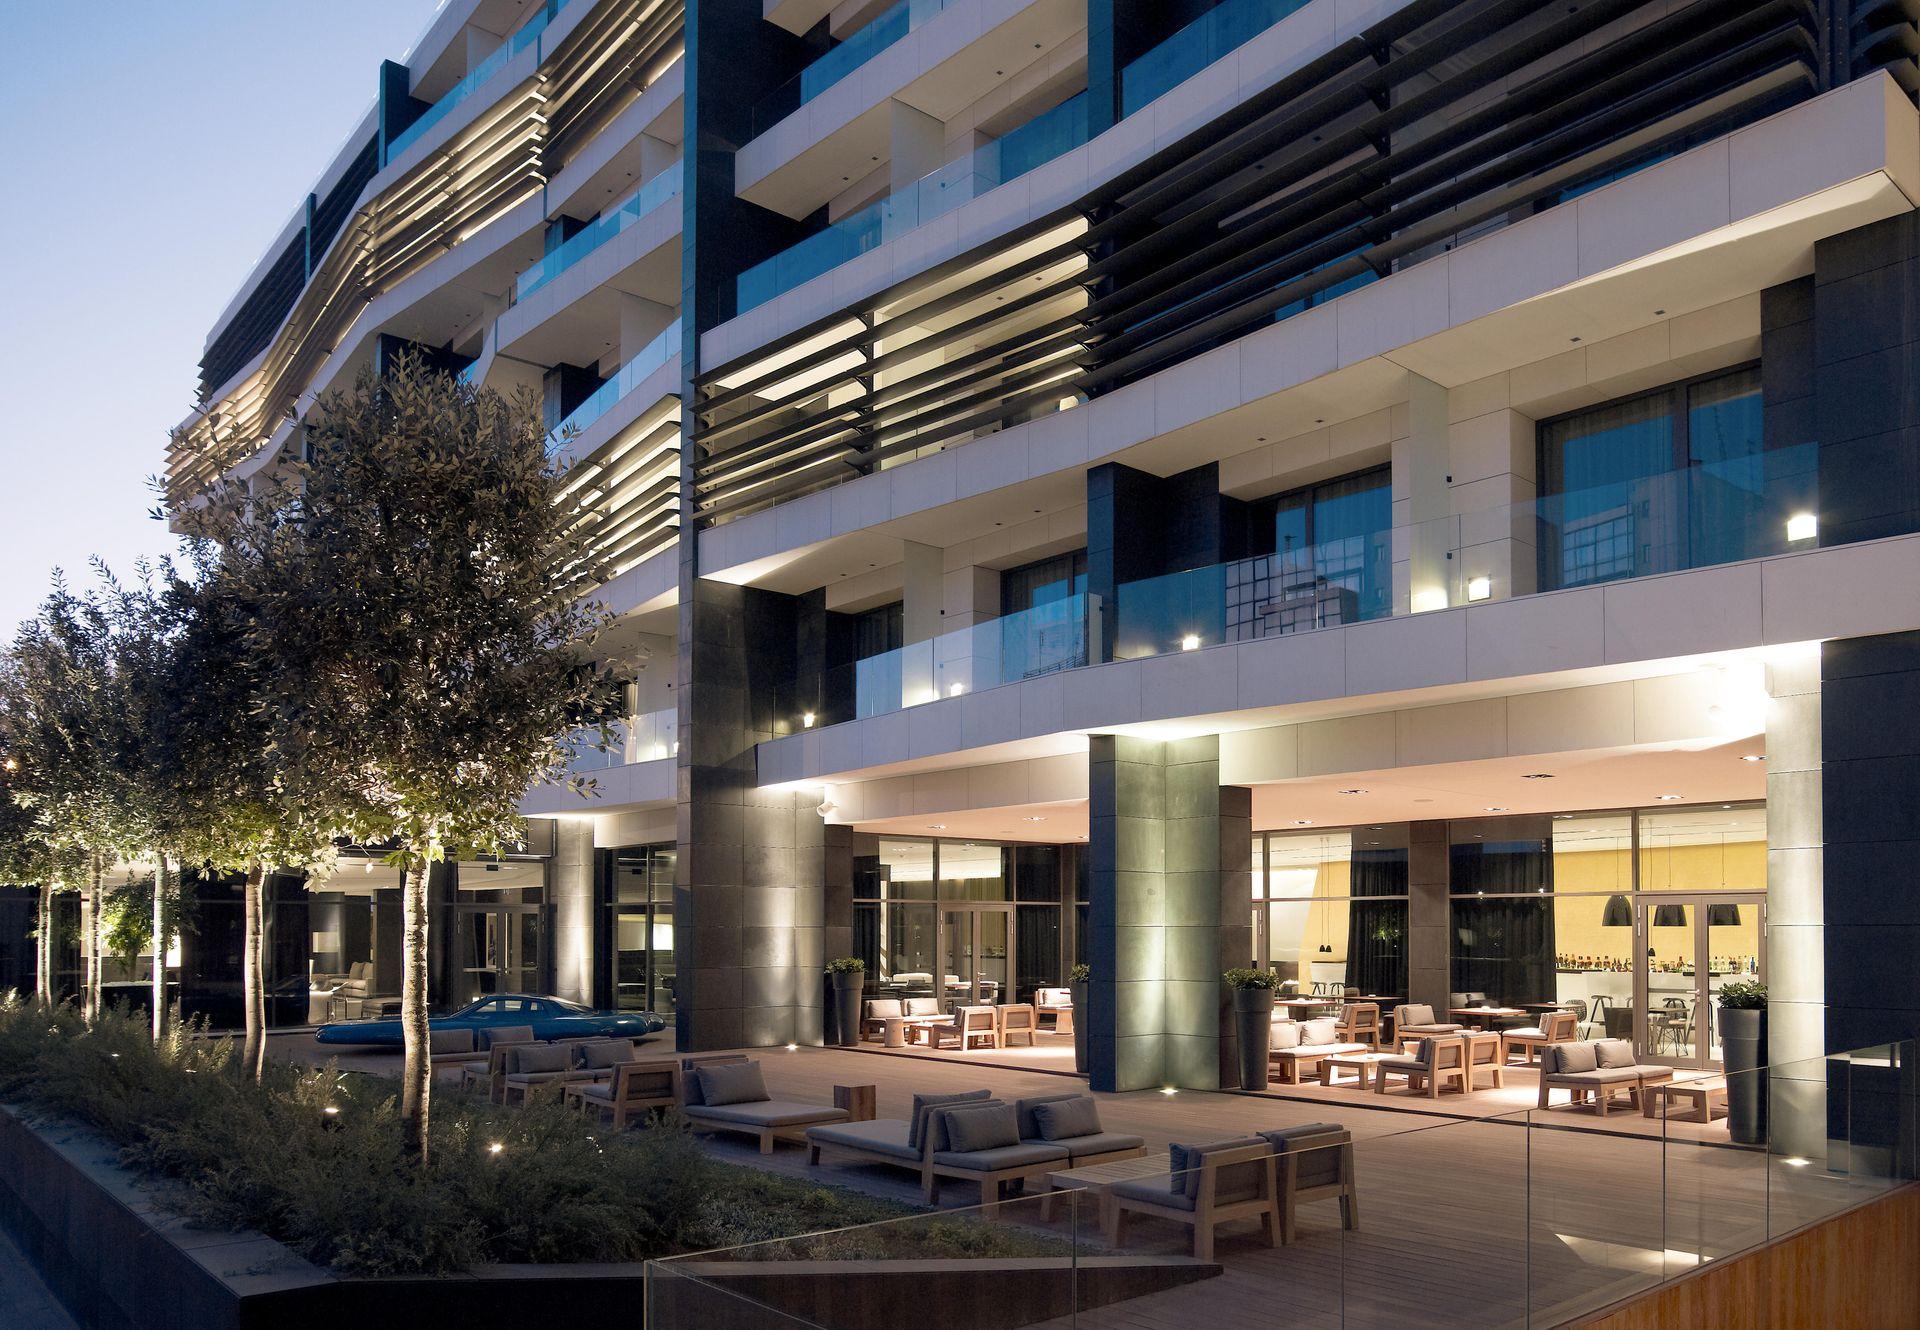 5* The Met Hotel Thessaloniki - Θεσσαλονίκη ? -15% ? 2 Ημέρες (1 Διανυκτέρευση) ? 2 άτομα ? Χωρίς Πρωινό ? έως 30/04/2020 ? <strong>Δώρο χαλαρωτικό μασάζ 50 λεπτών ανά άτομο</strong>